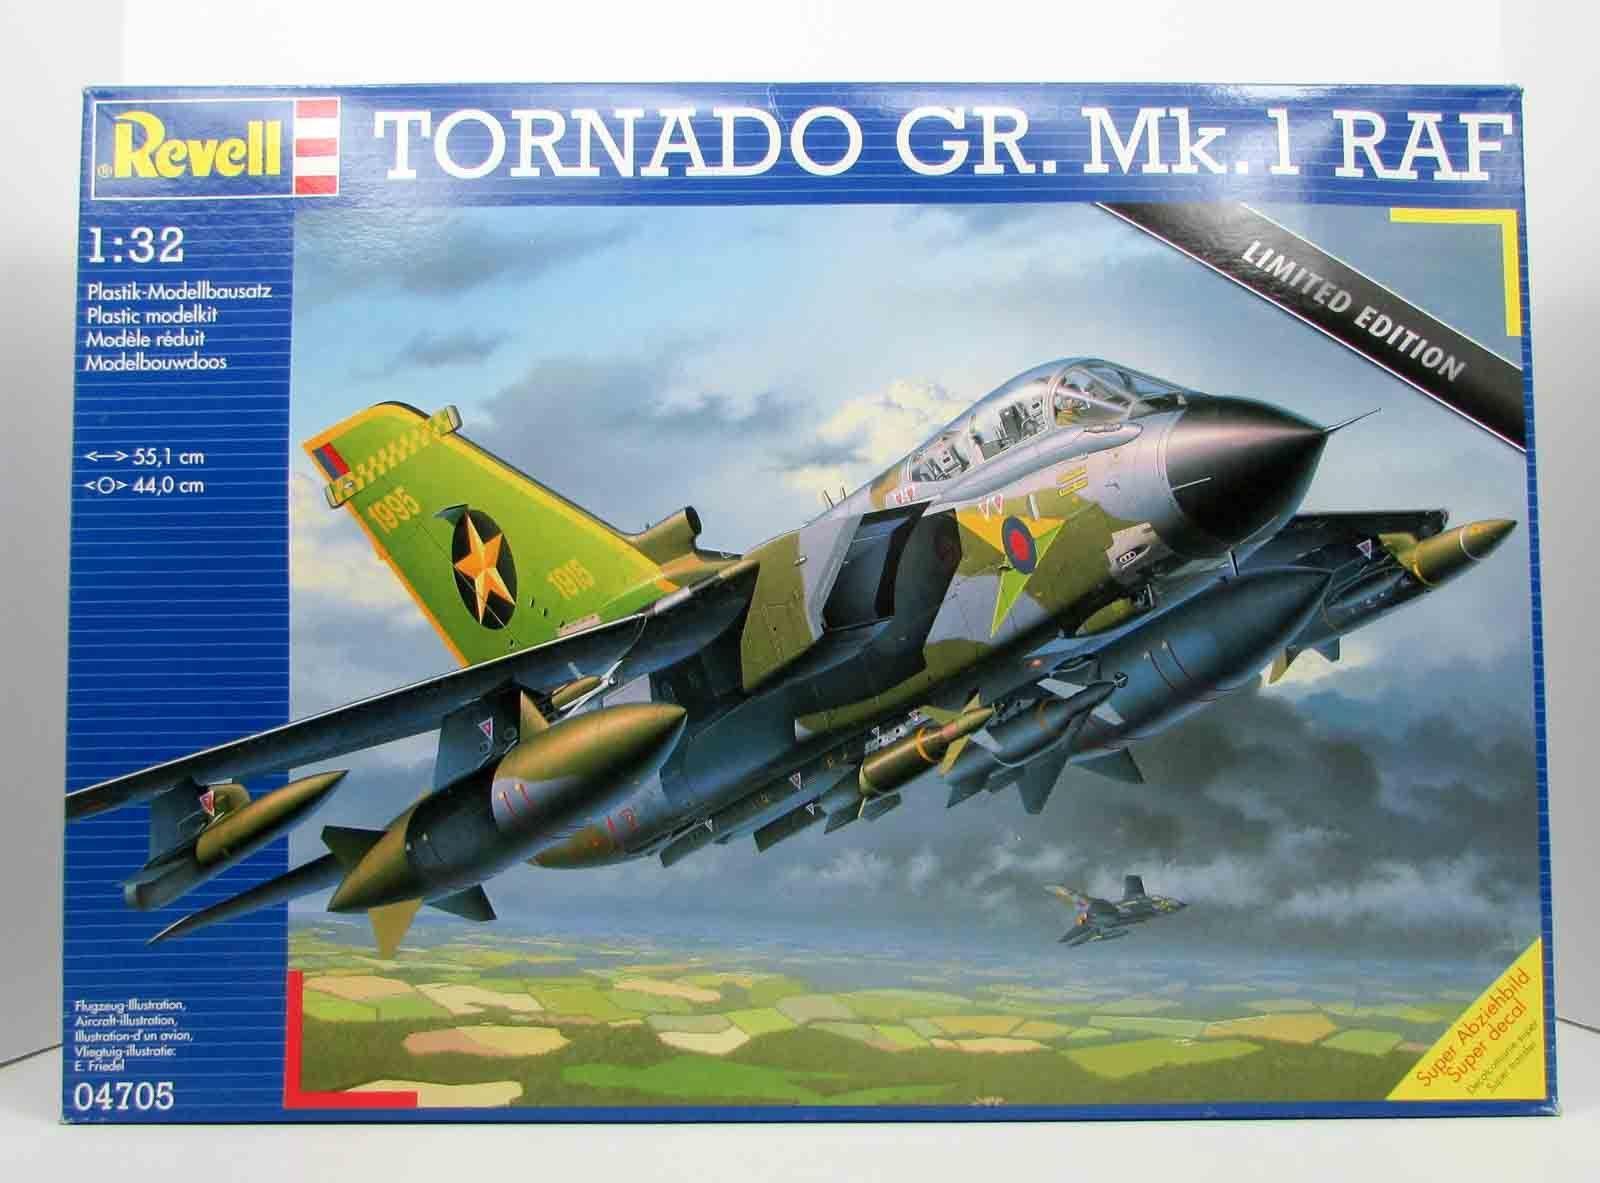 Tornado GR. Mk. 1 RAF Revell 04705 1/32 Airplane Model Kit